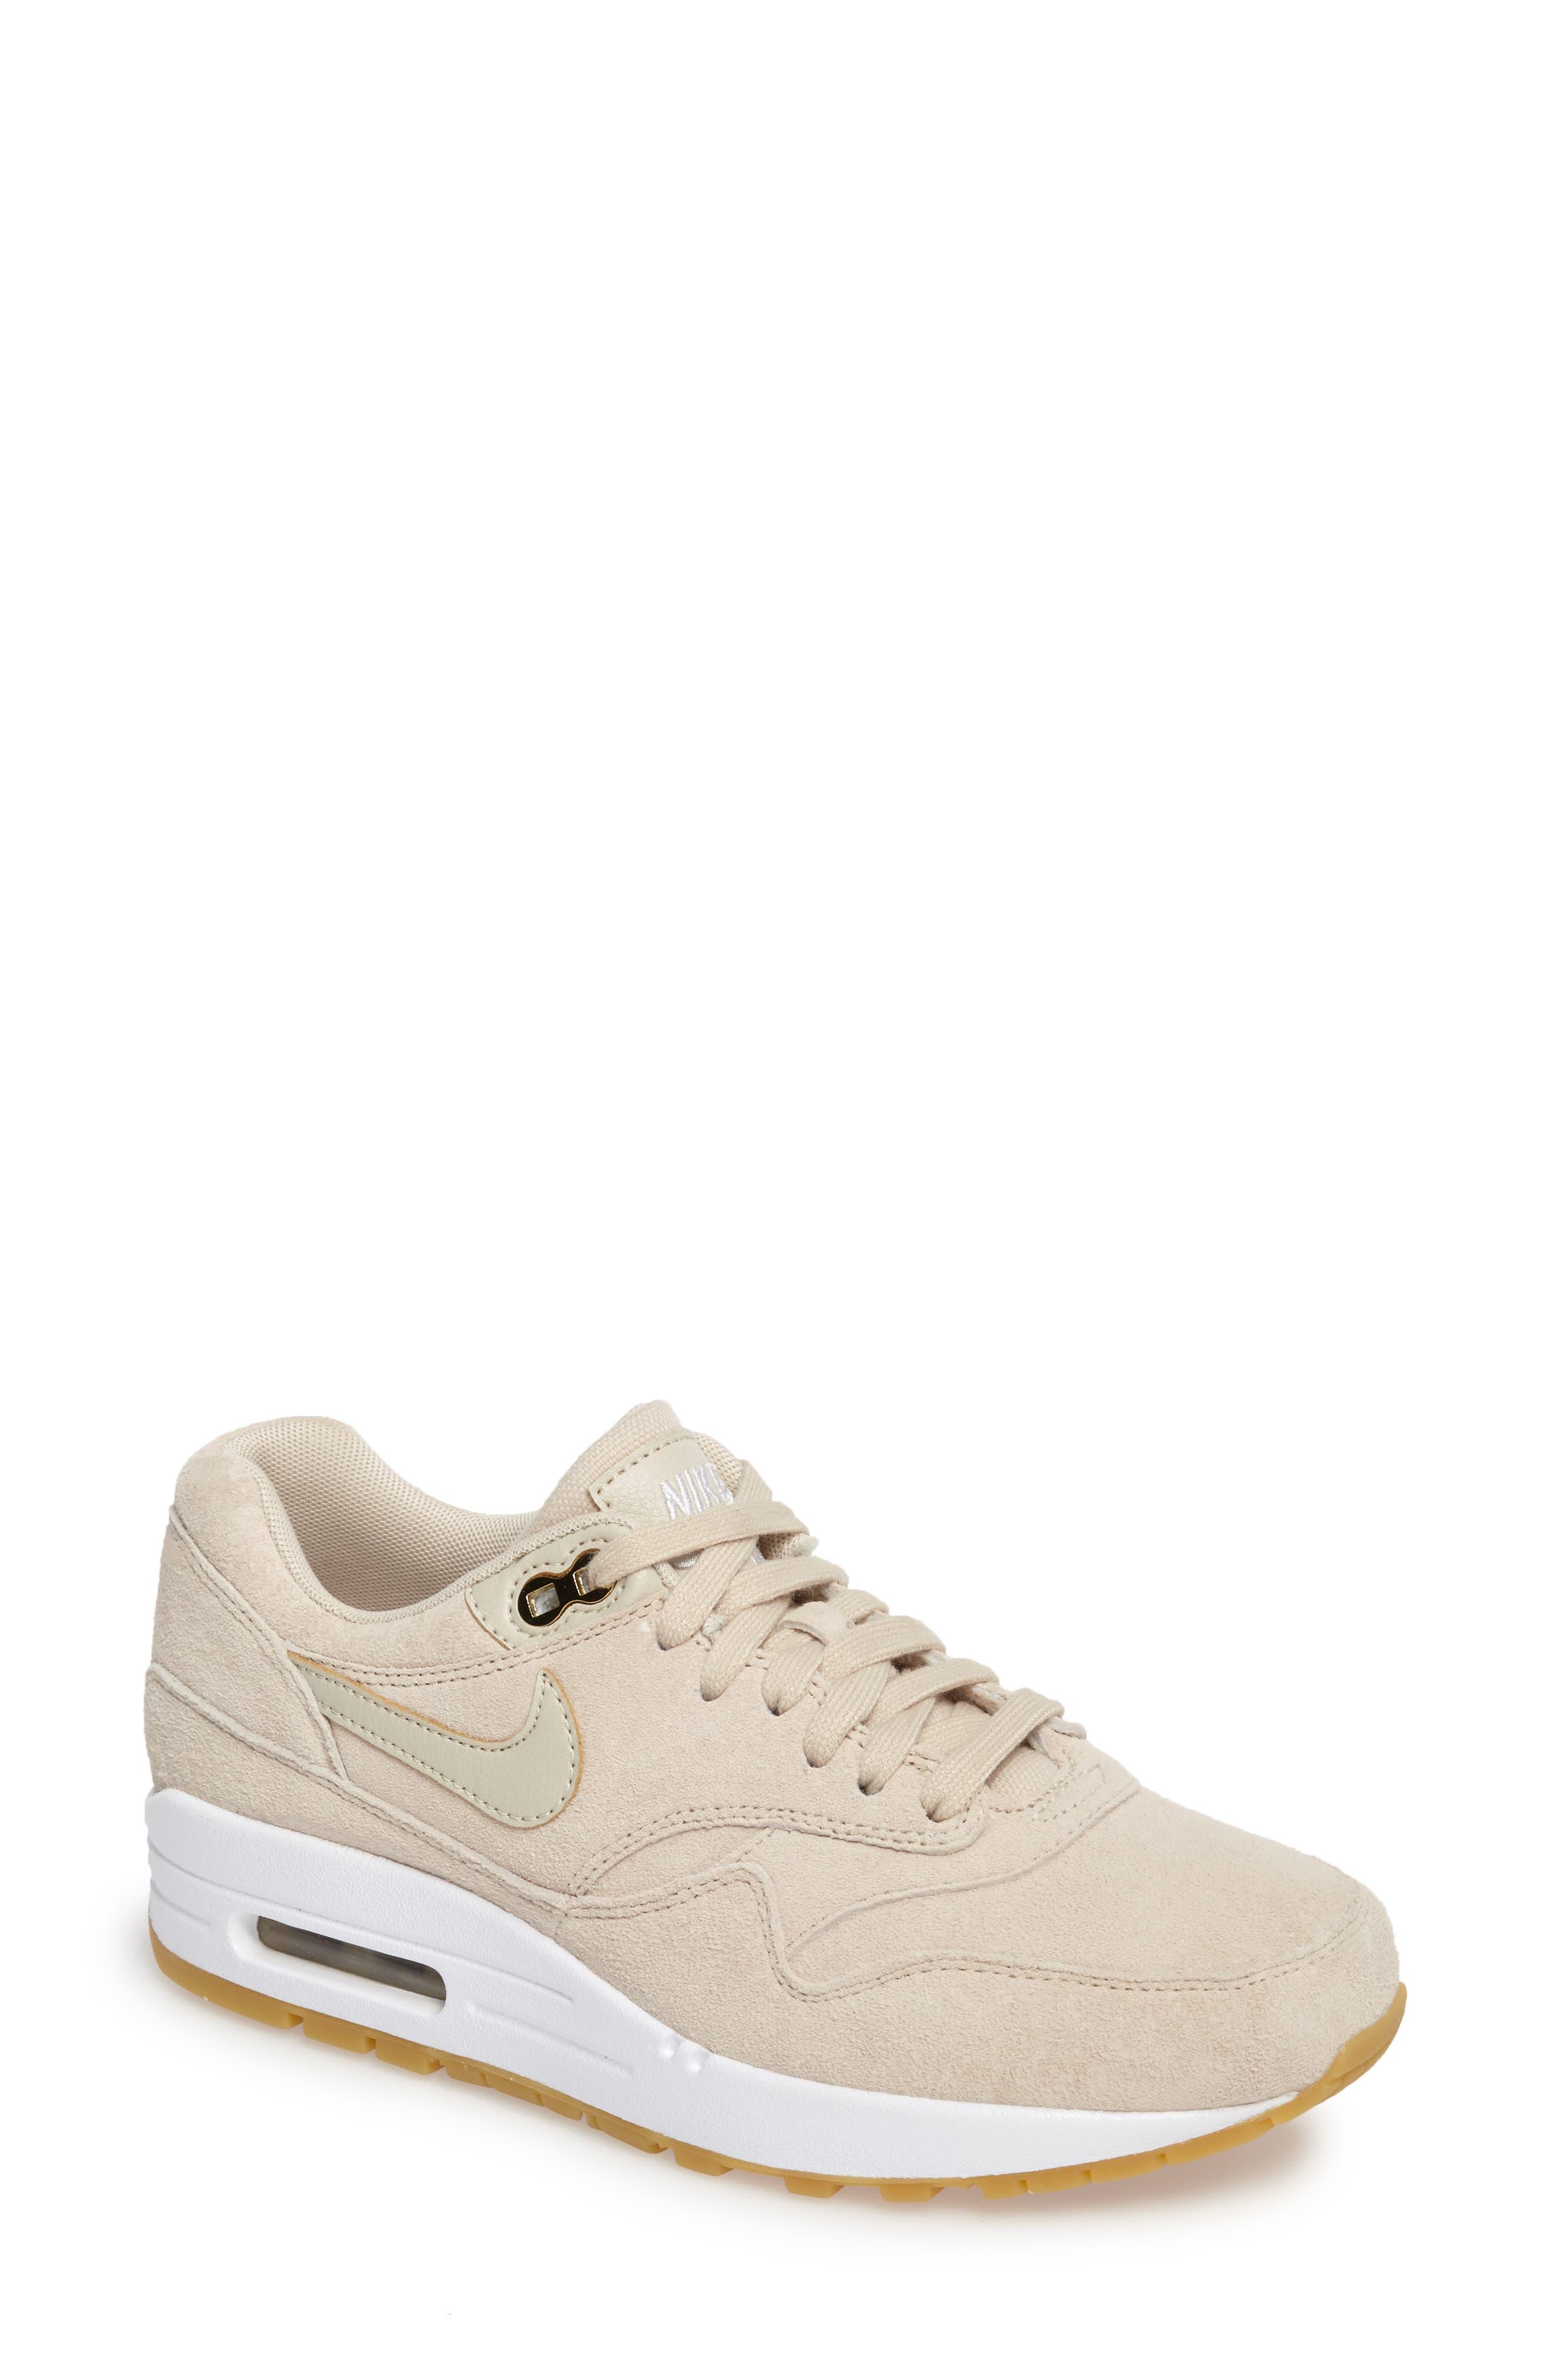 Air Max 1 SD Sneaker,                             Main thumbnail 1, color,                             250